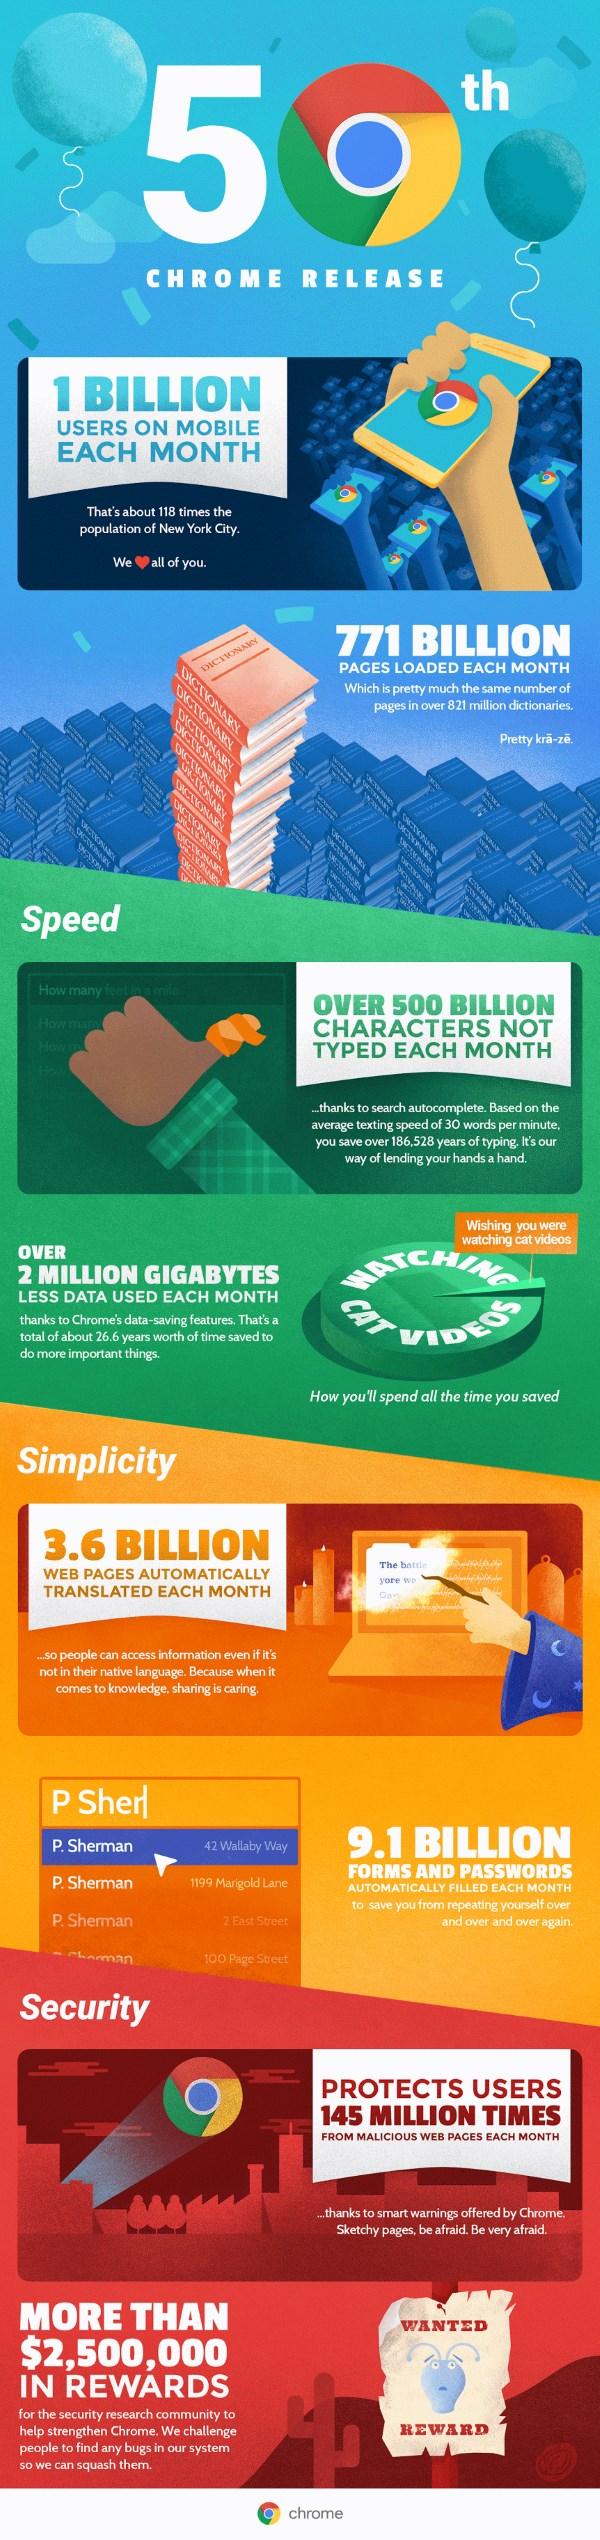 Chrome 50 Infographic